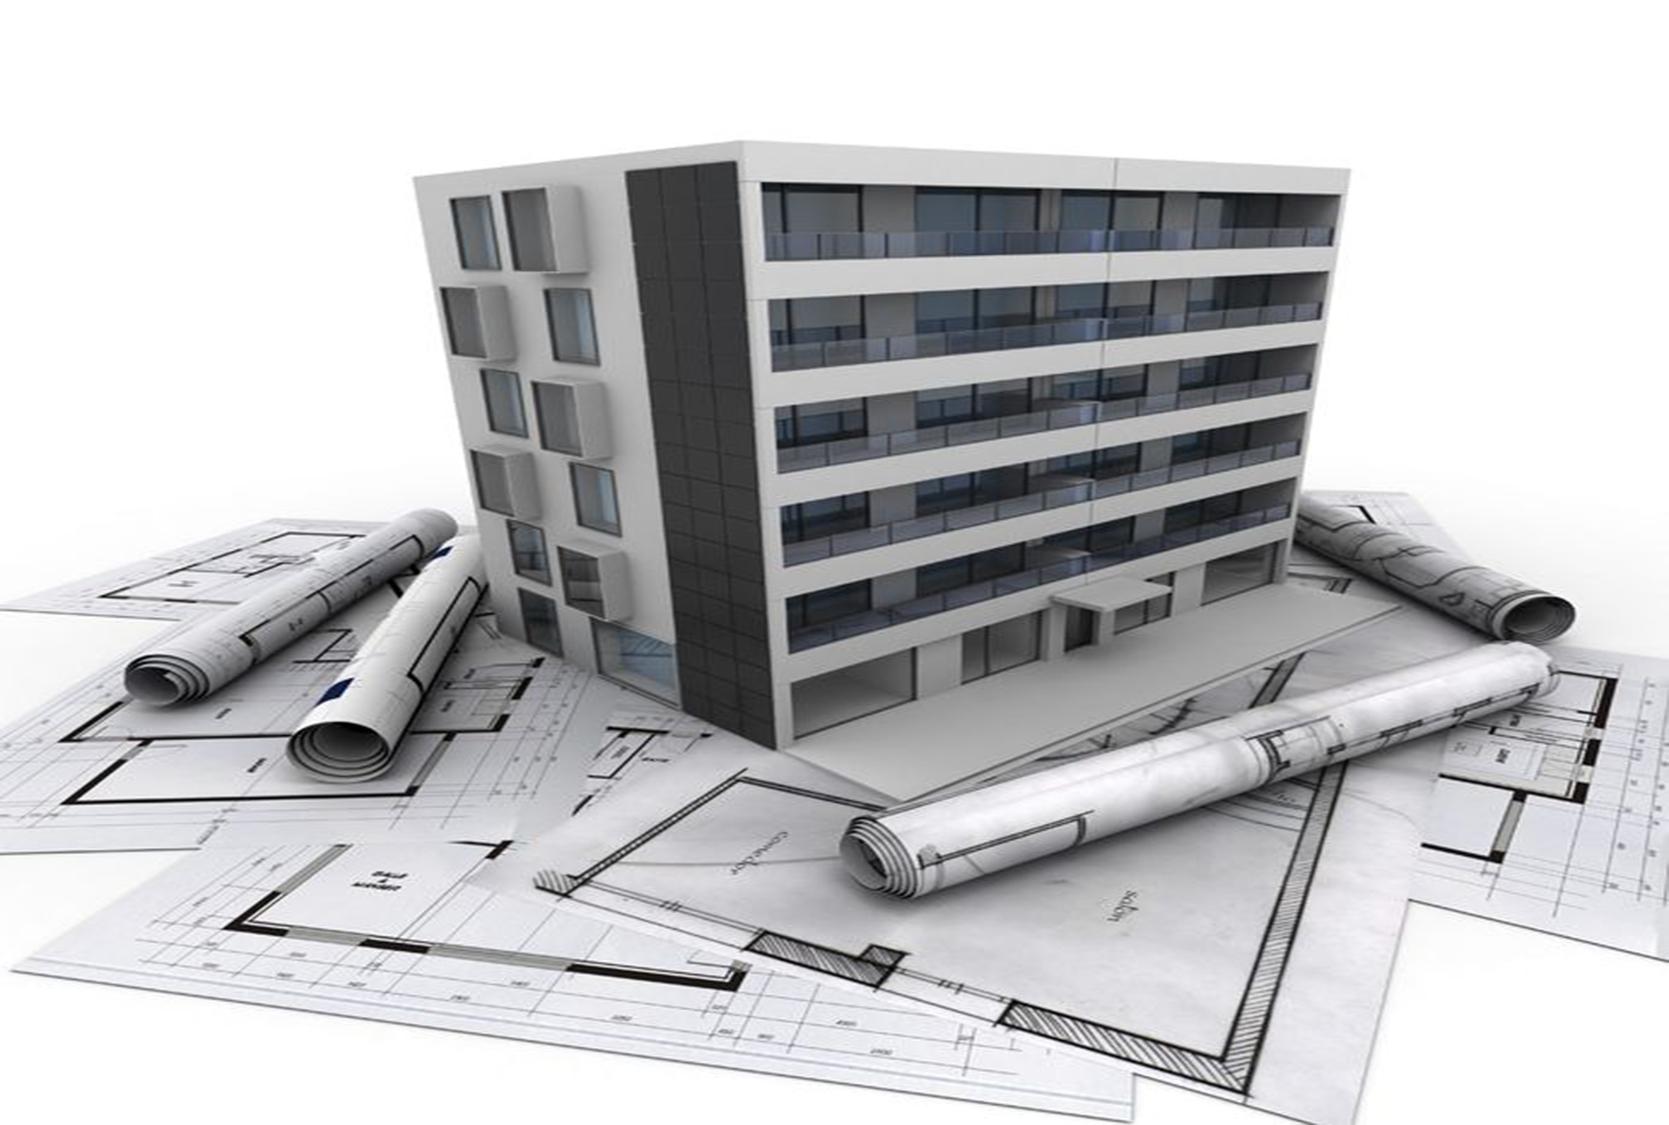 Real Estate Development: Entitlements, Land-Use & Joint Ventures